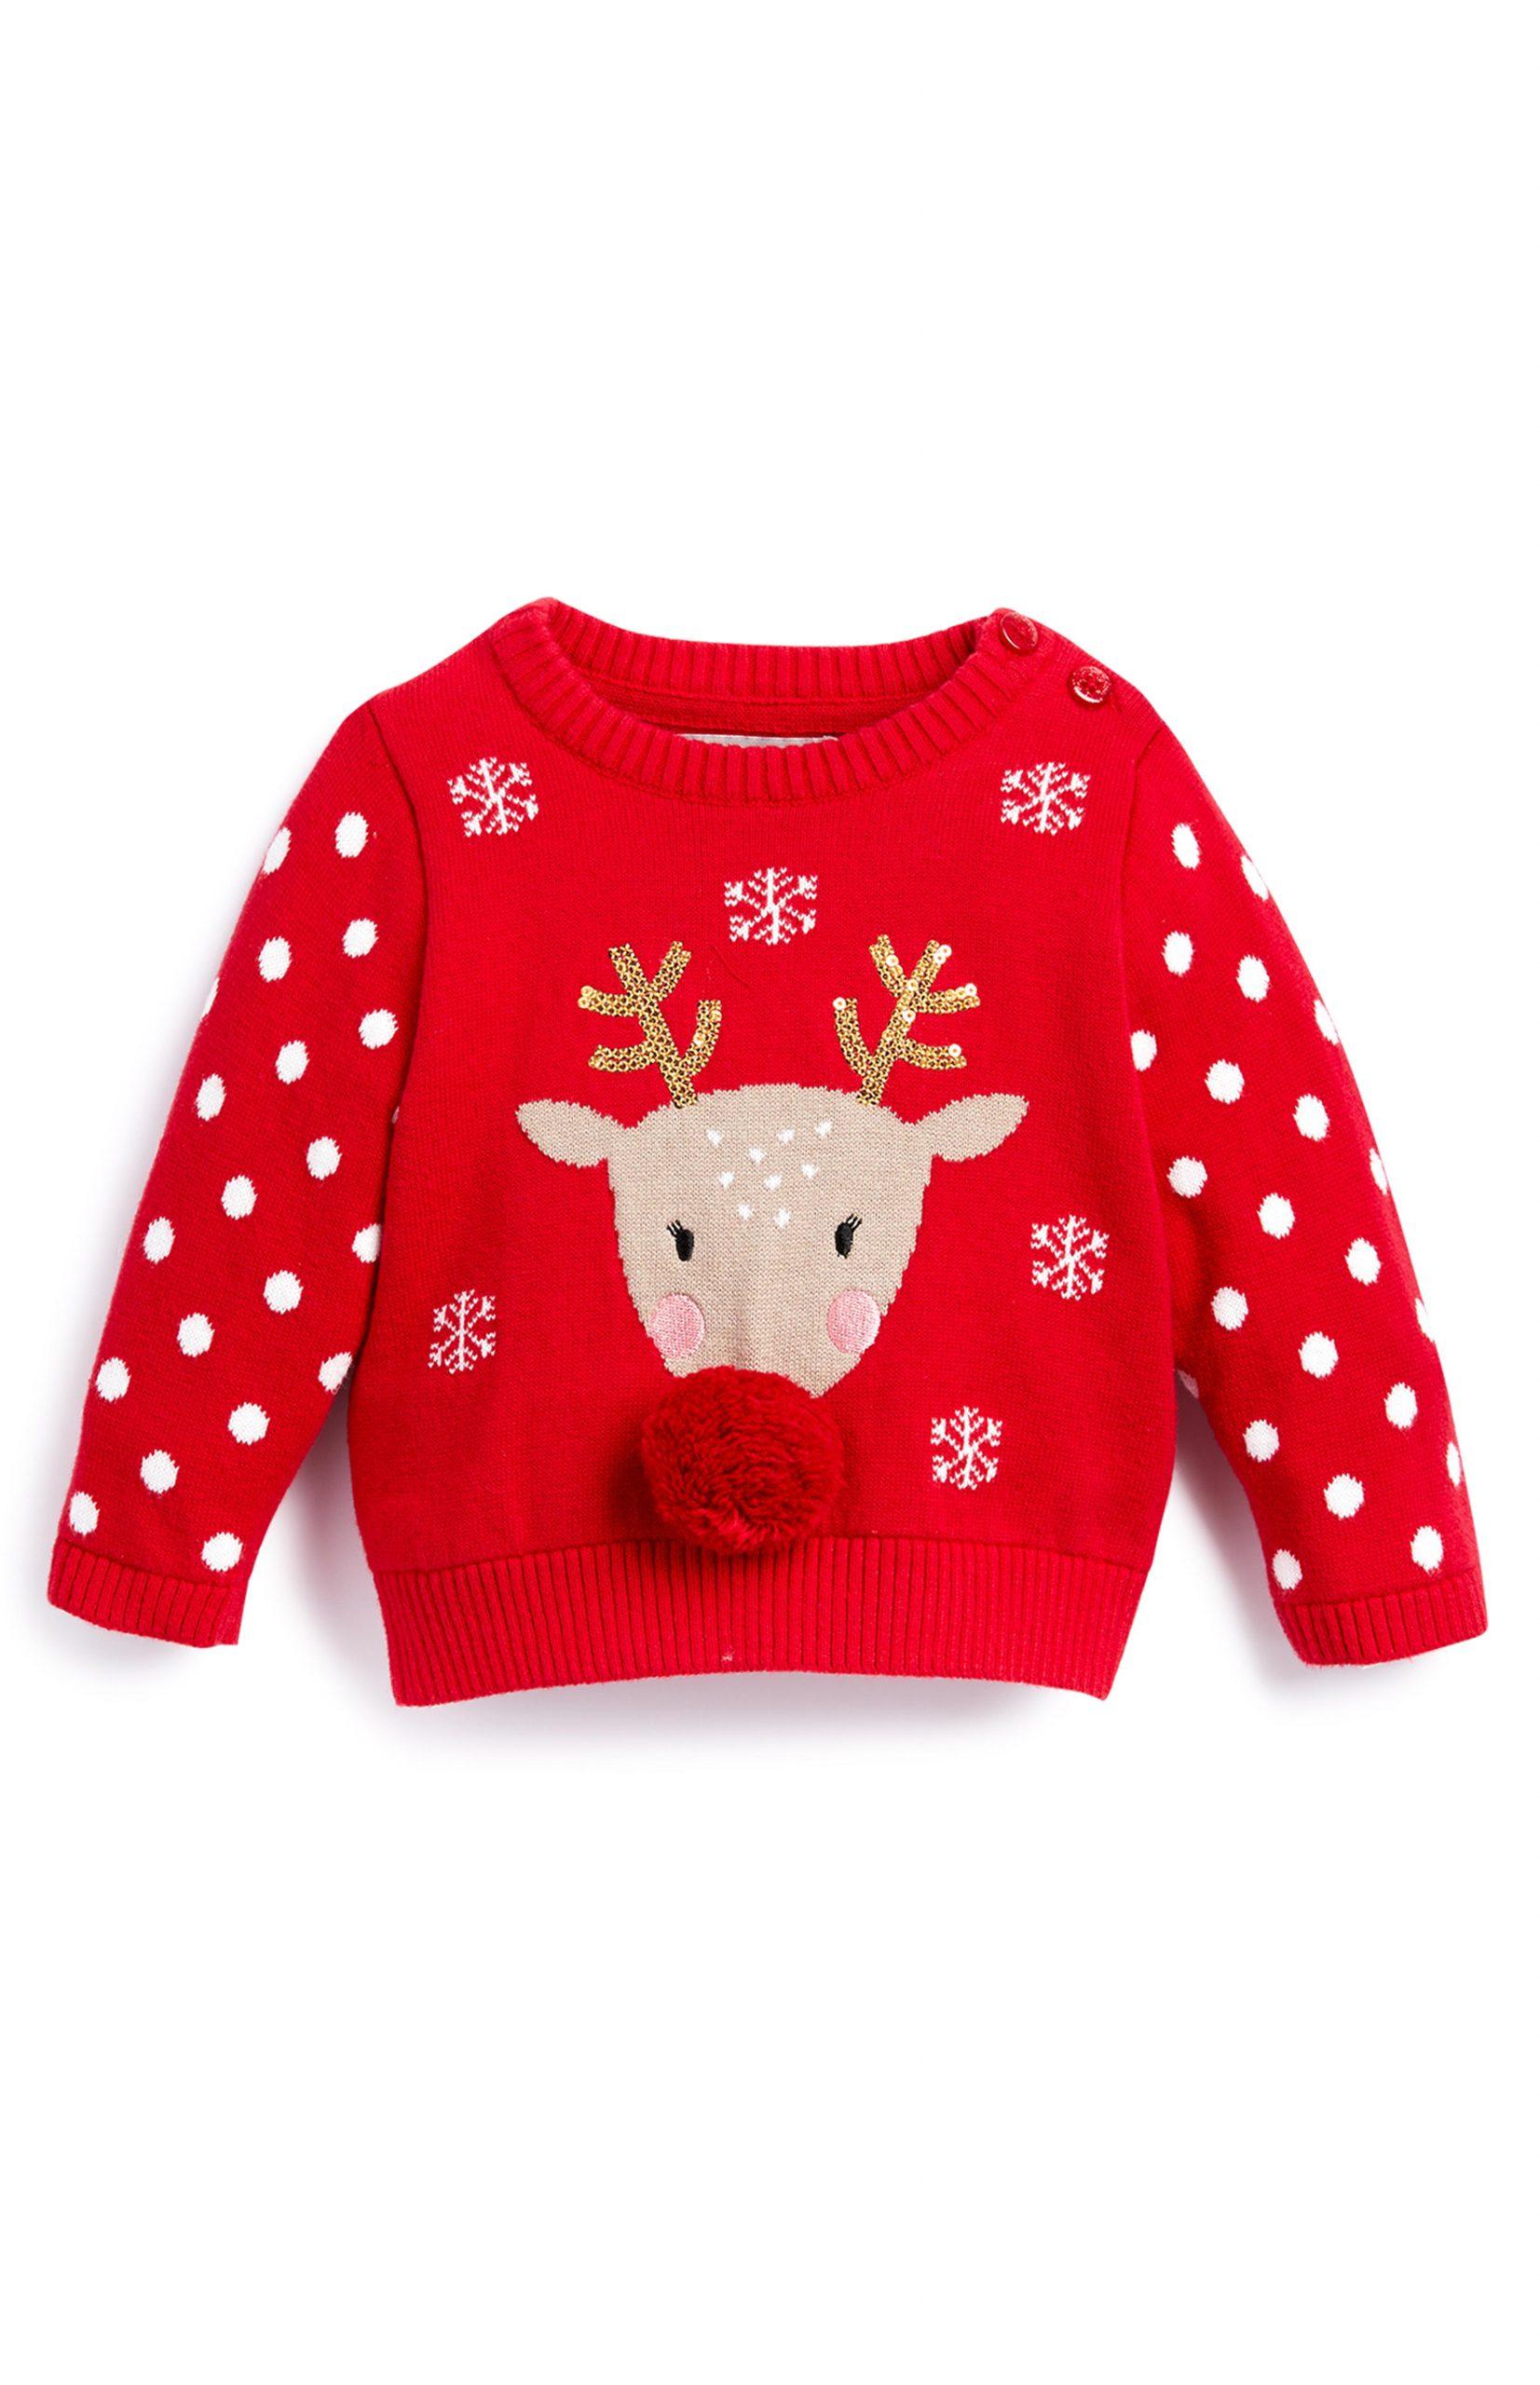 jerseys de Navidad unisex de Primark